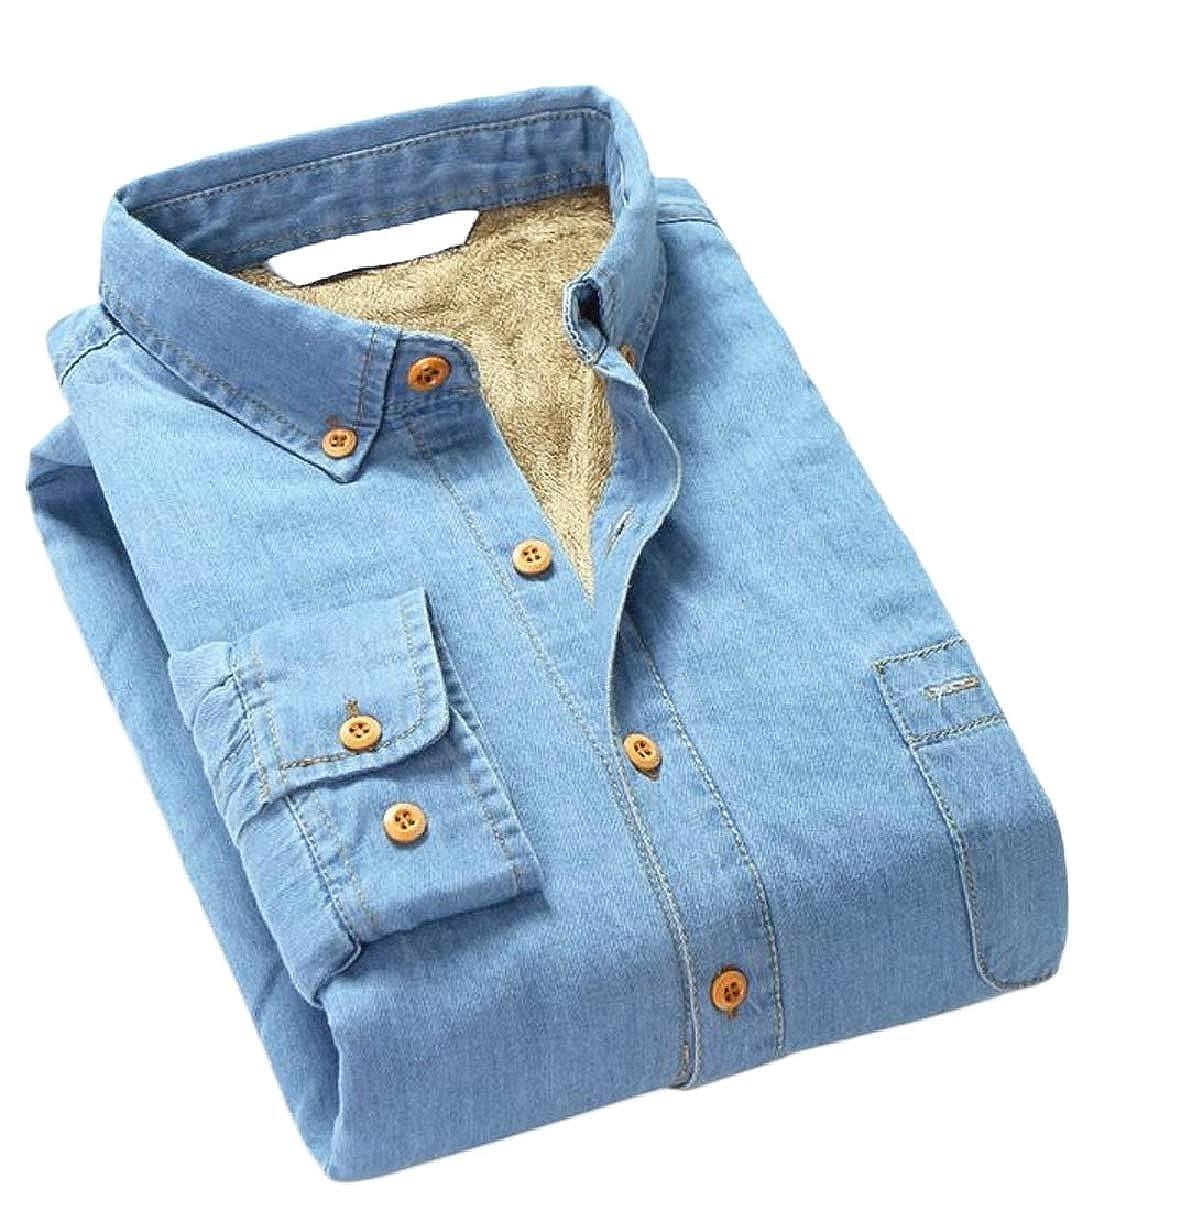 CBTLVSN Mens Slim Casual Thicken Button Down Denim Shirts Long Sleeve Shirt